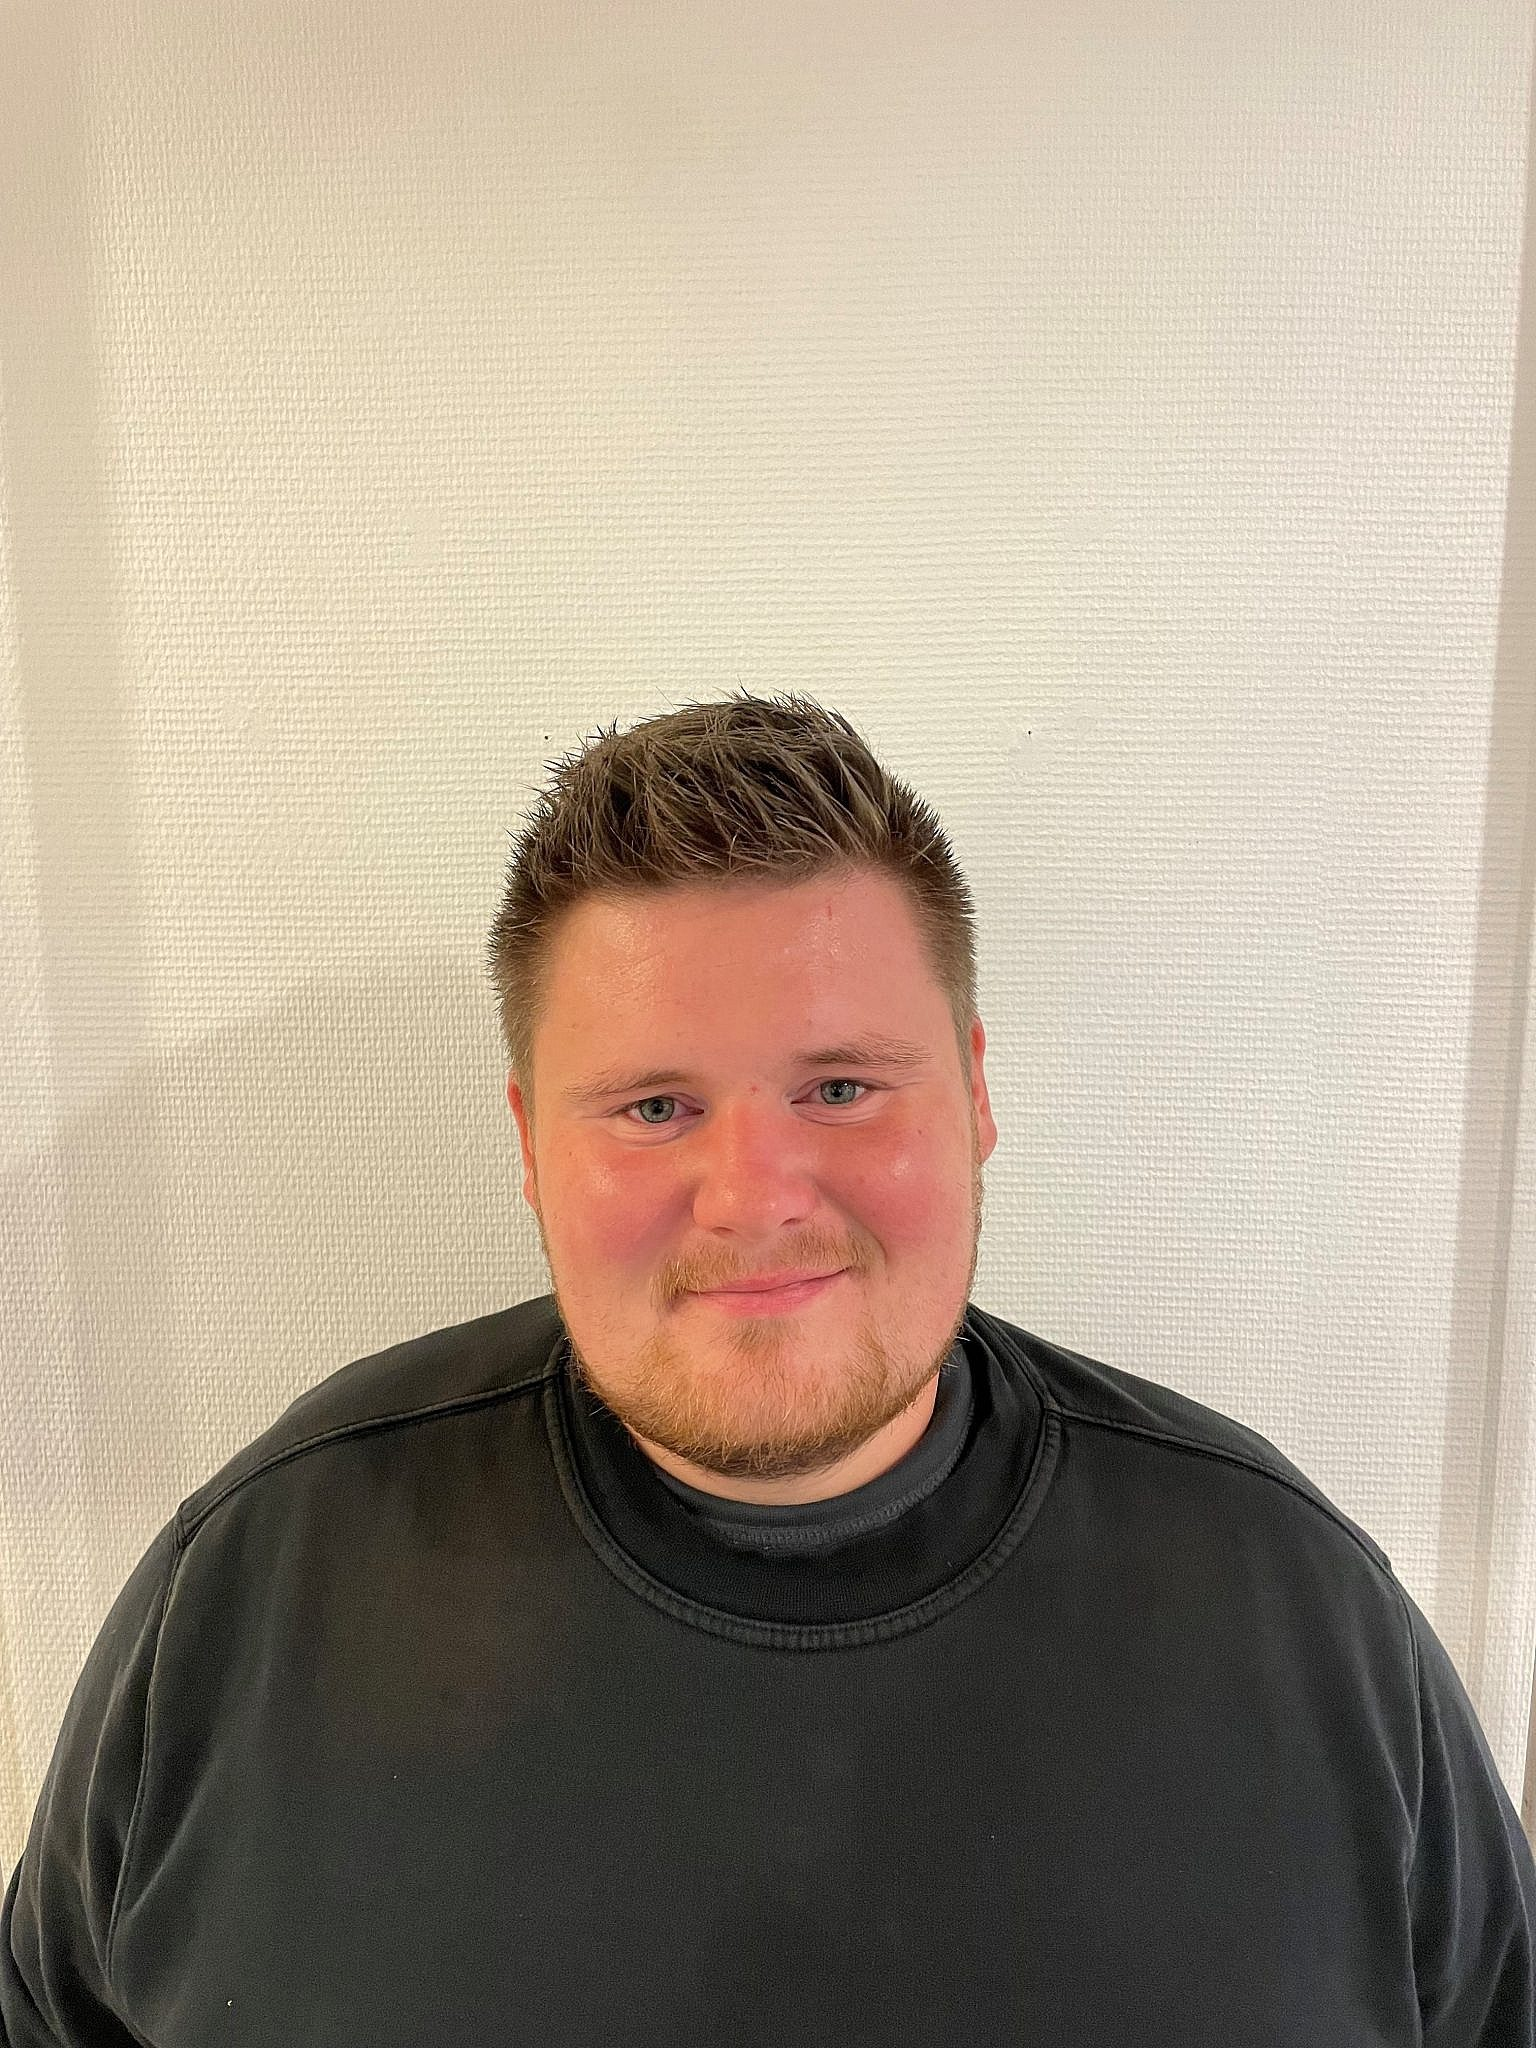 Andreas Munk Maul Thomsen